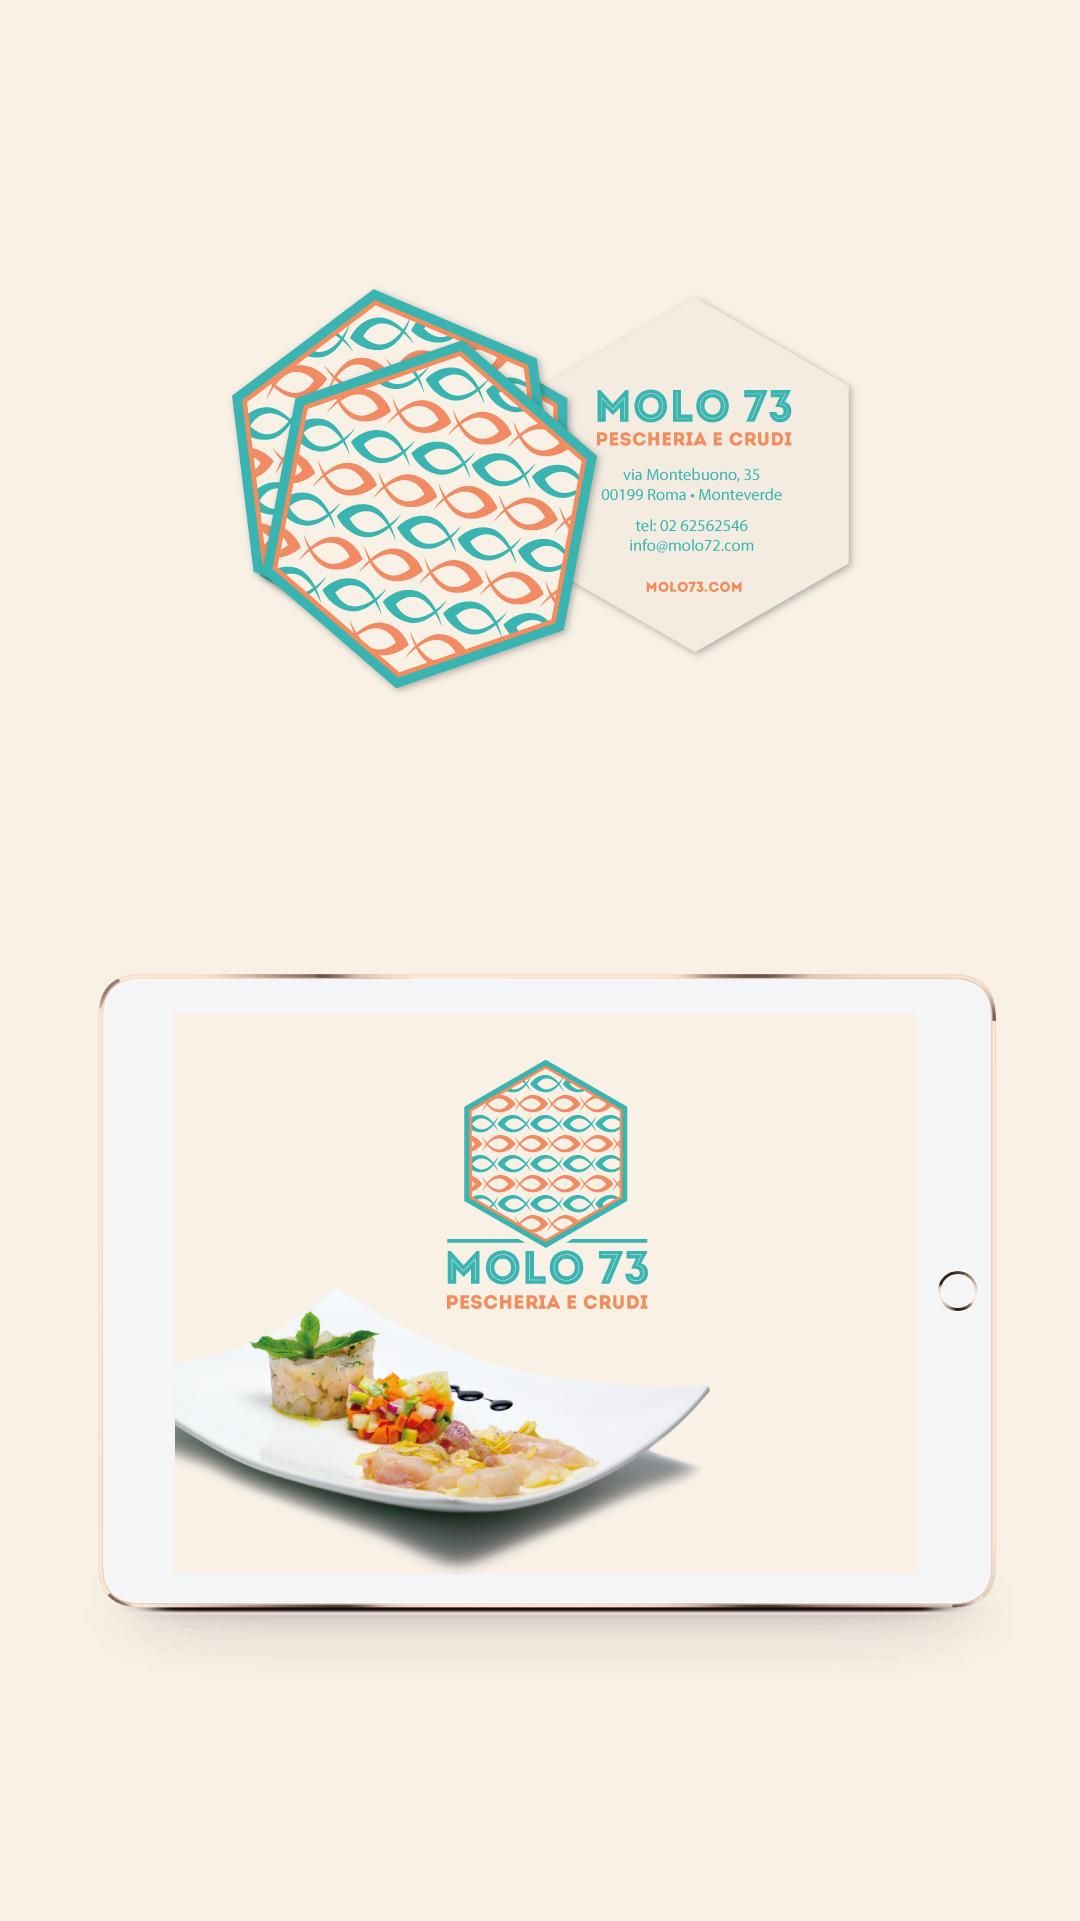 https://www.orlandinifrancesco.com/wp/wp-content/uploads/2019/01/Molo-72-Logo-4.jpg